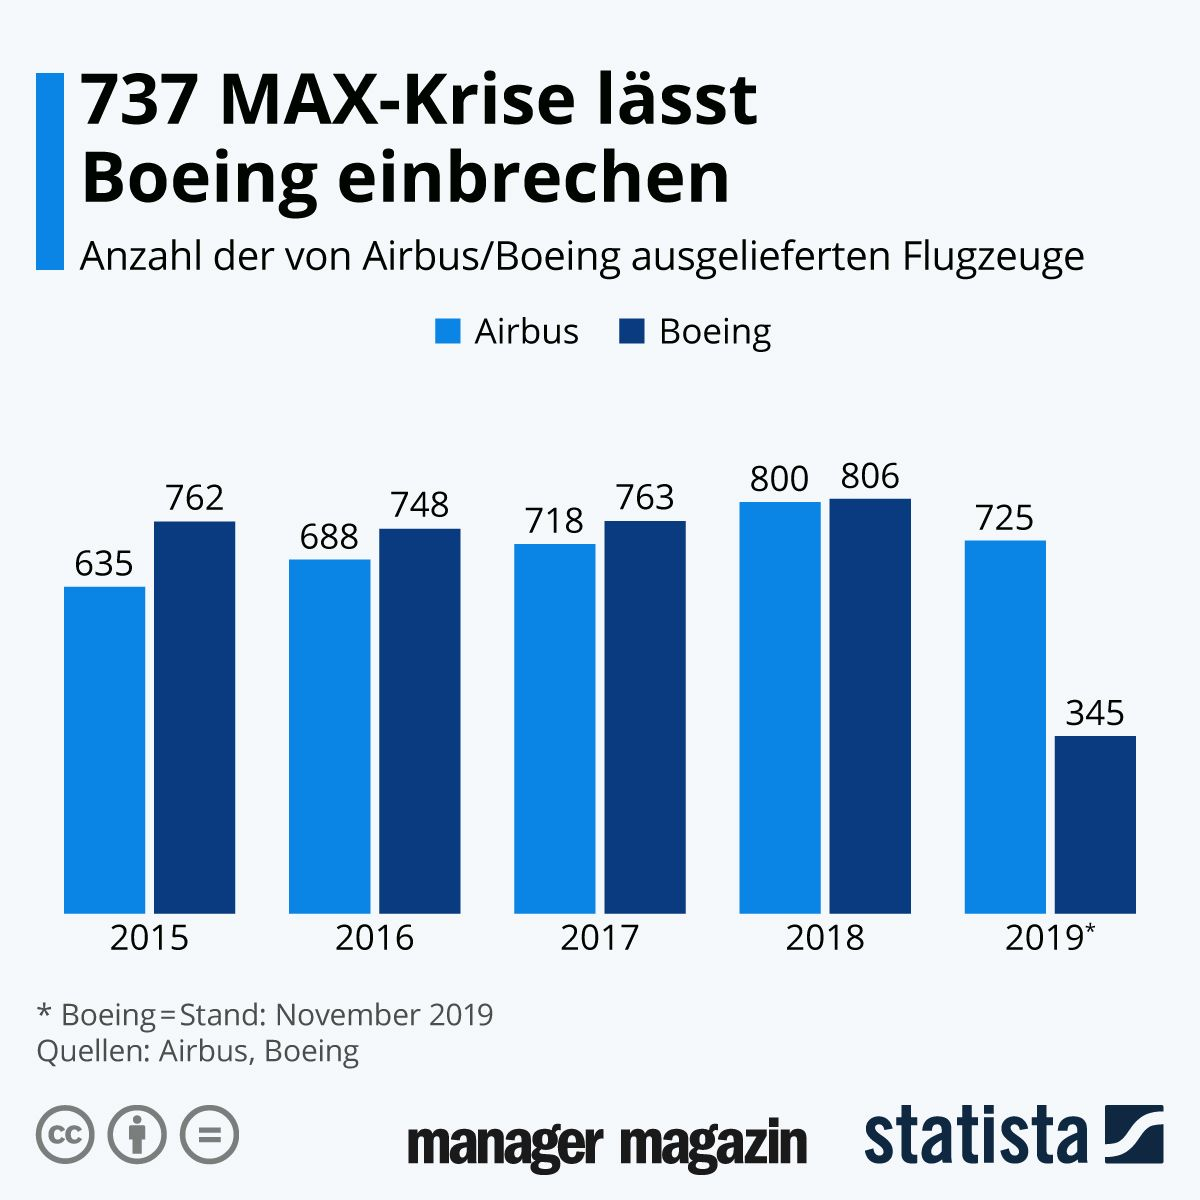 GRAFIK 737 MAX-Krise